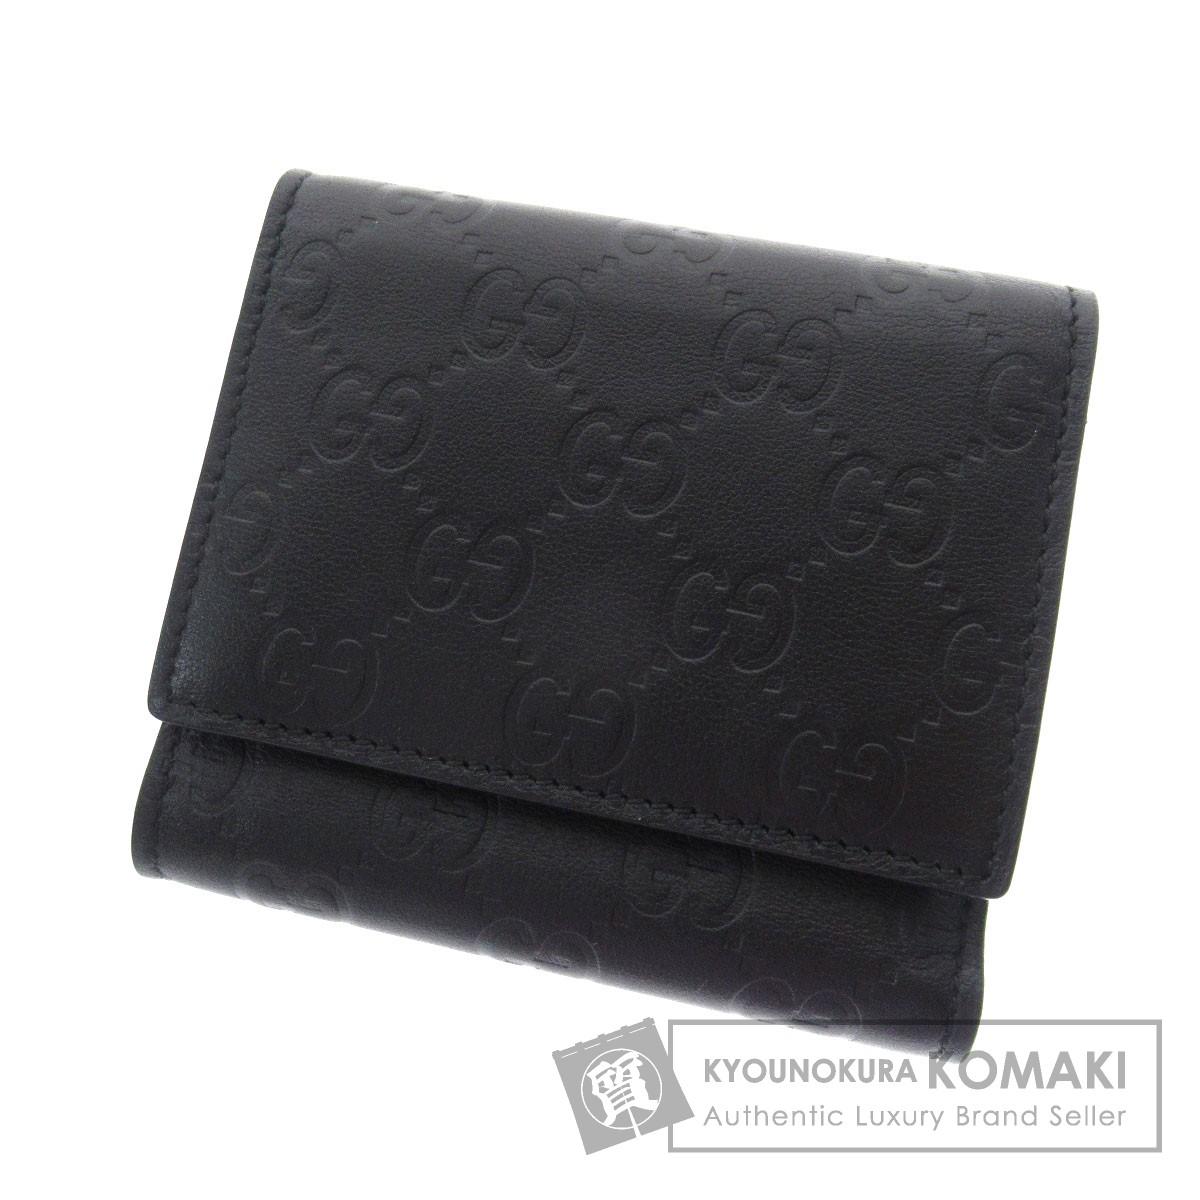 GUCCI 268533 グッチシマ 二つ折り財布(小銭入れあり) レザー メンズ 【中古】【グッチ】